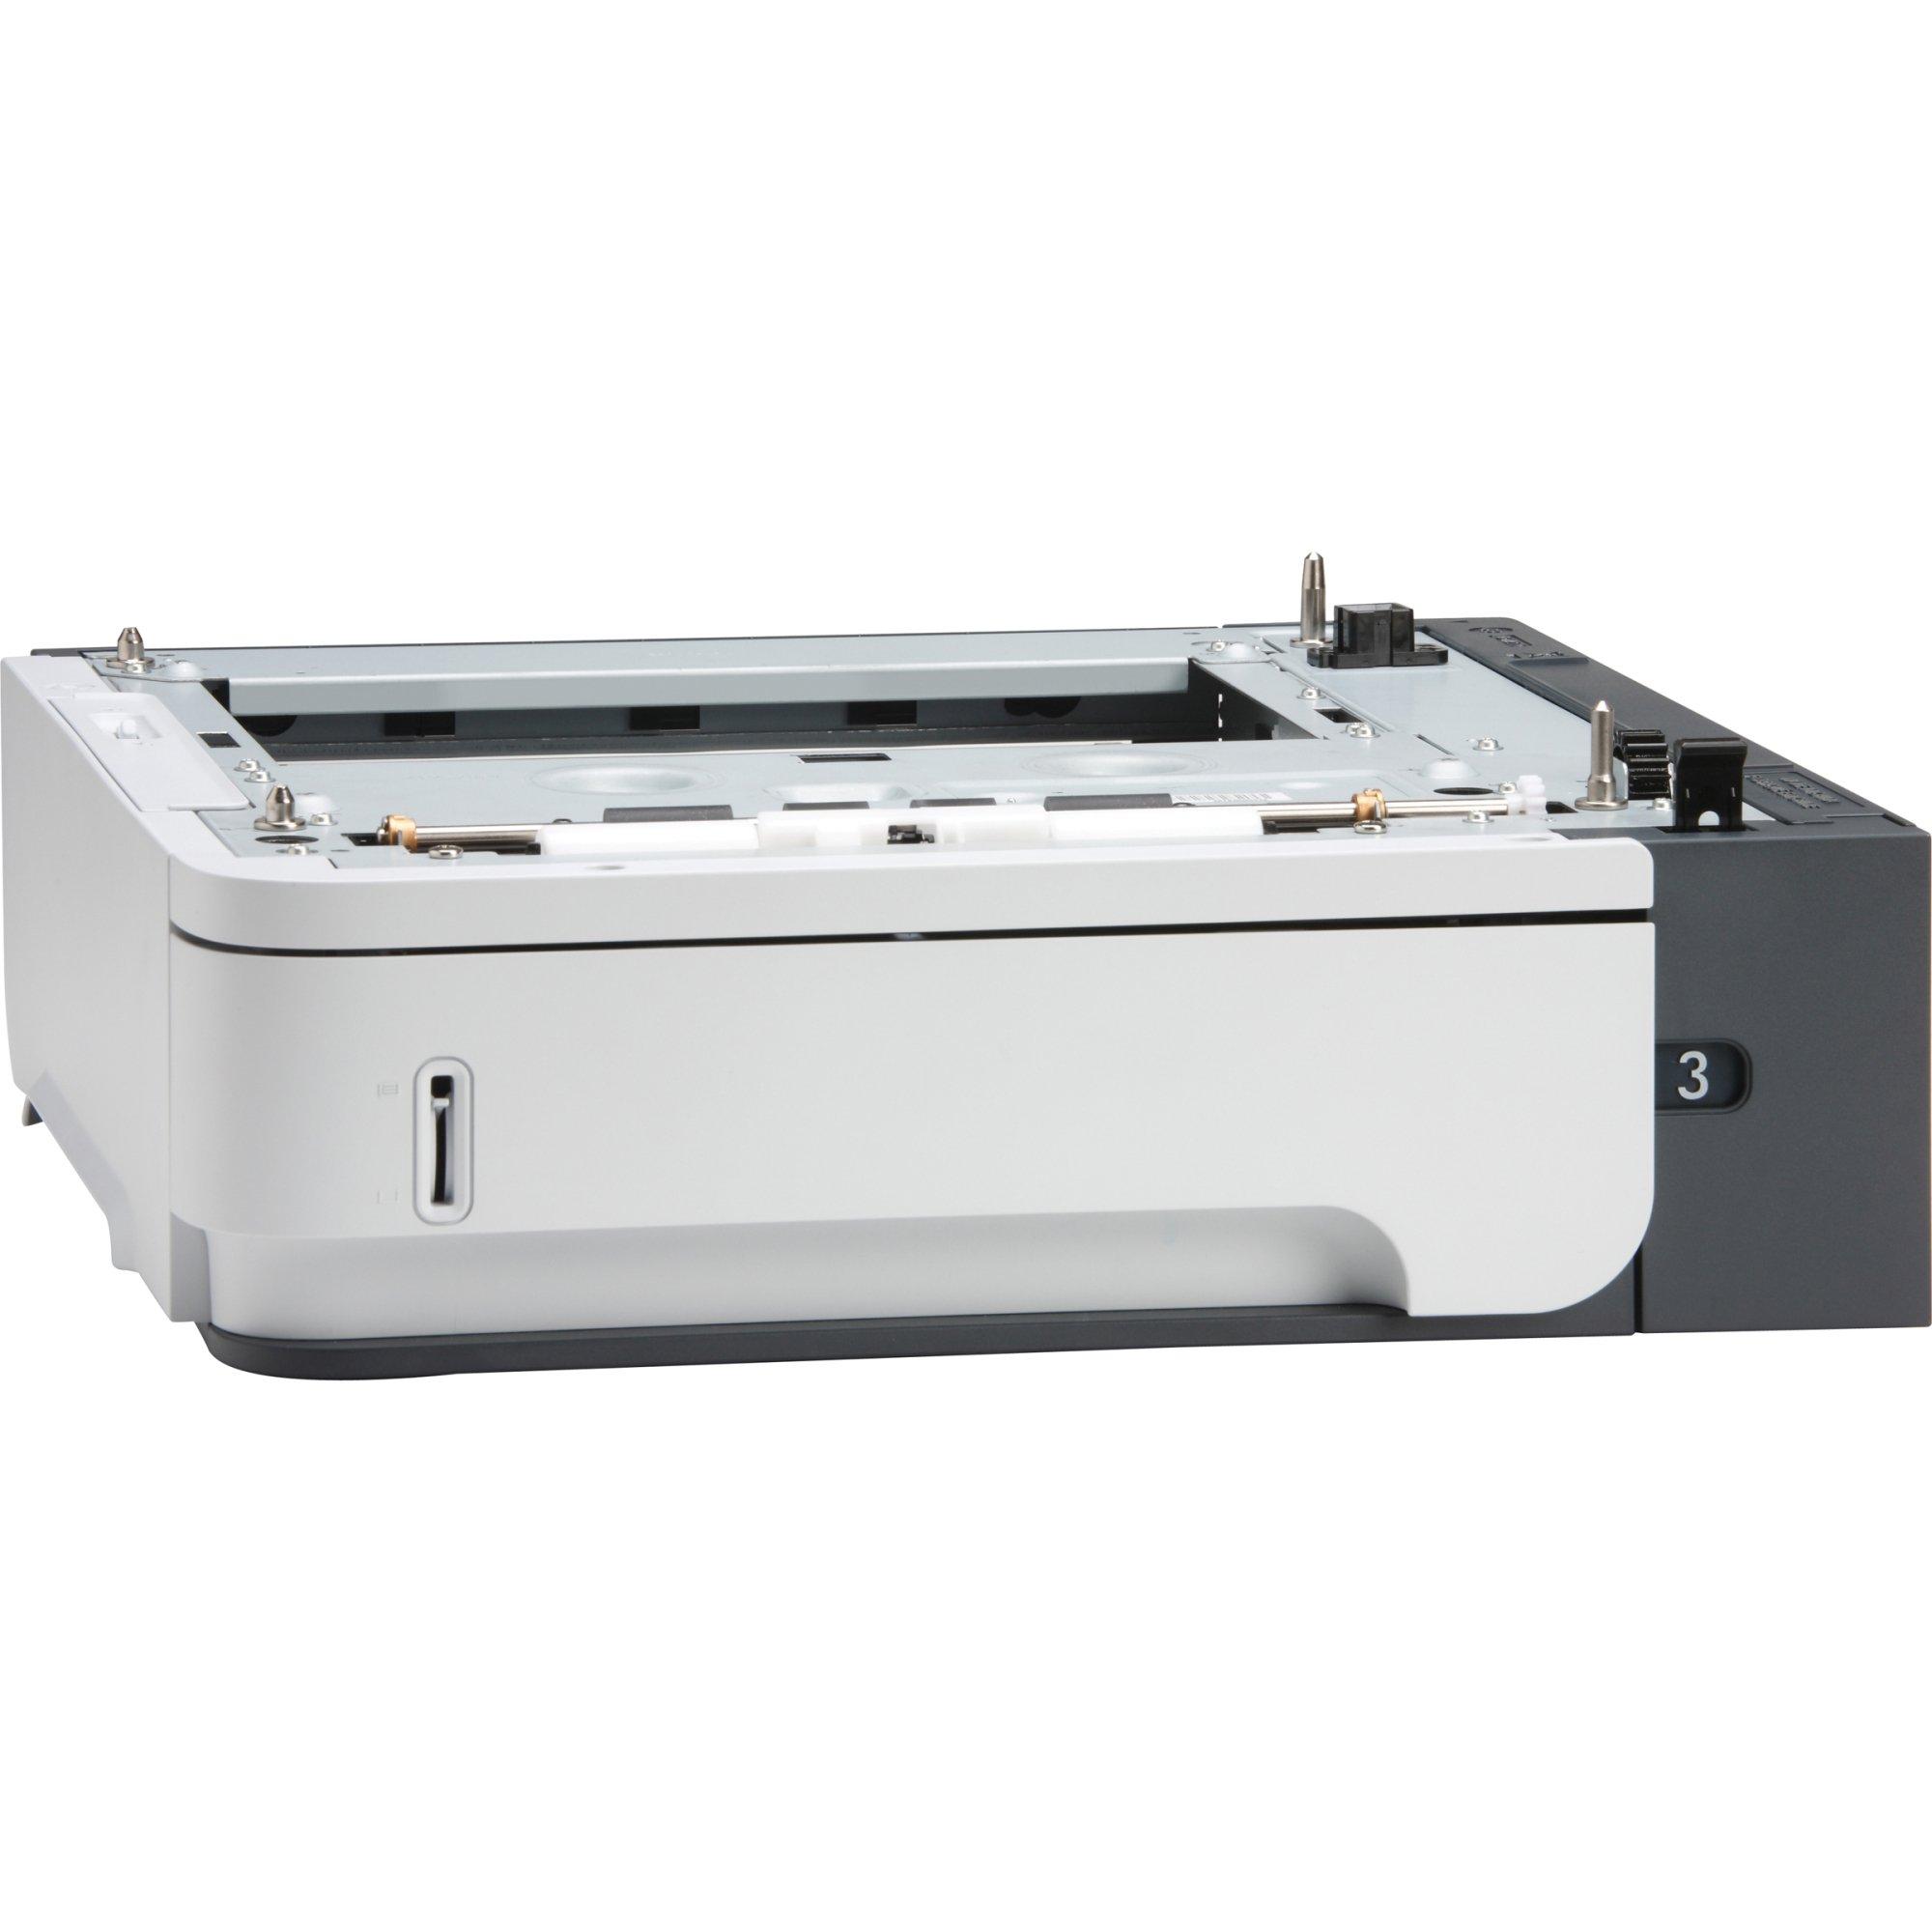 HP CF406A Media tray / feeder - 500 sheets - for LaserJet Pro 400 MFP M425dn, 400 MFP M425dw